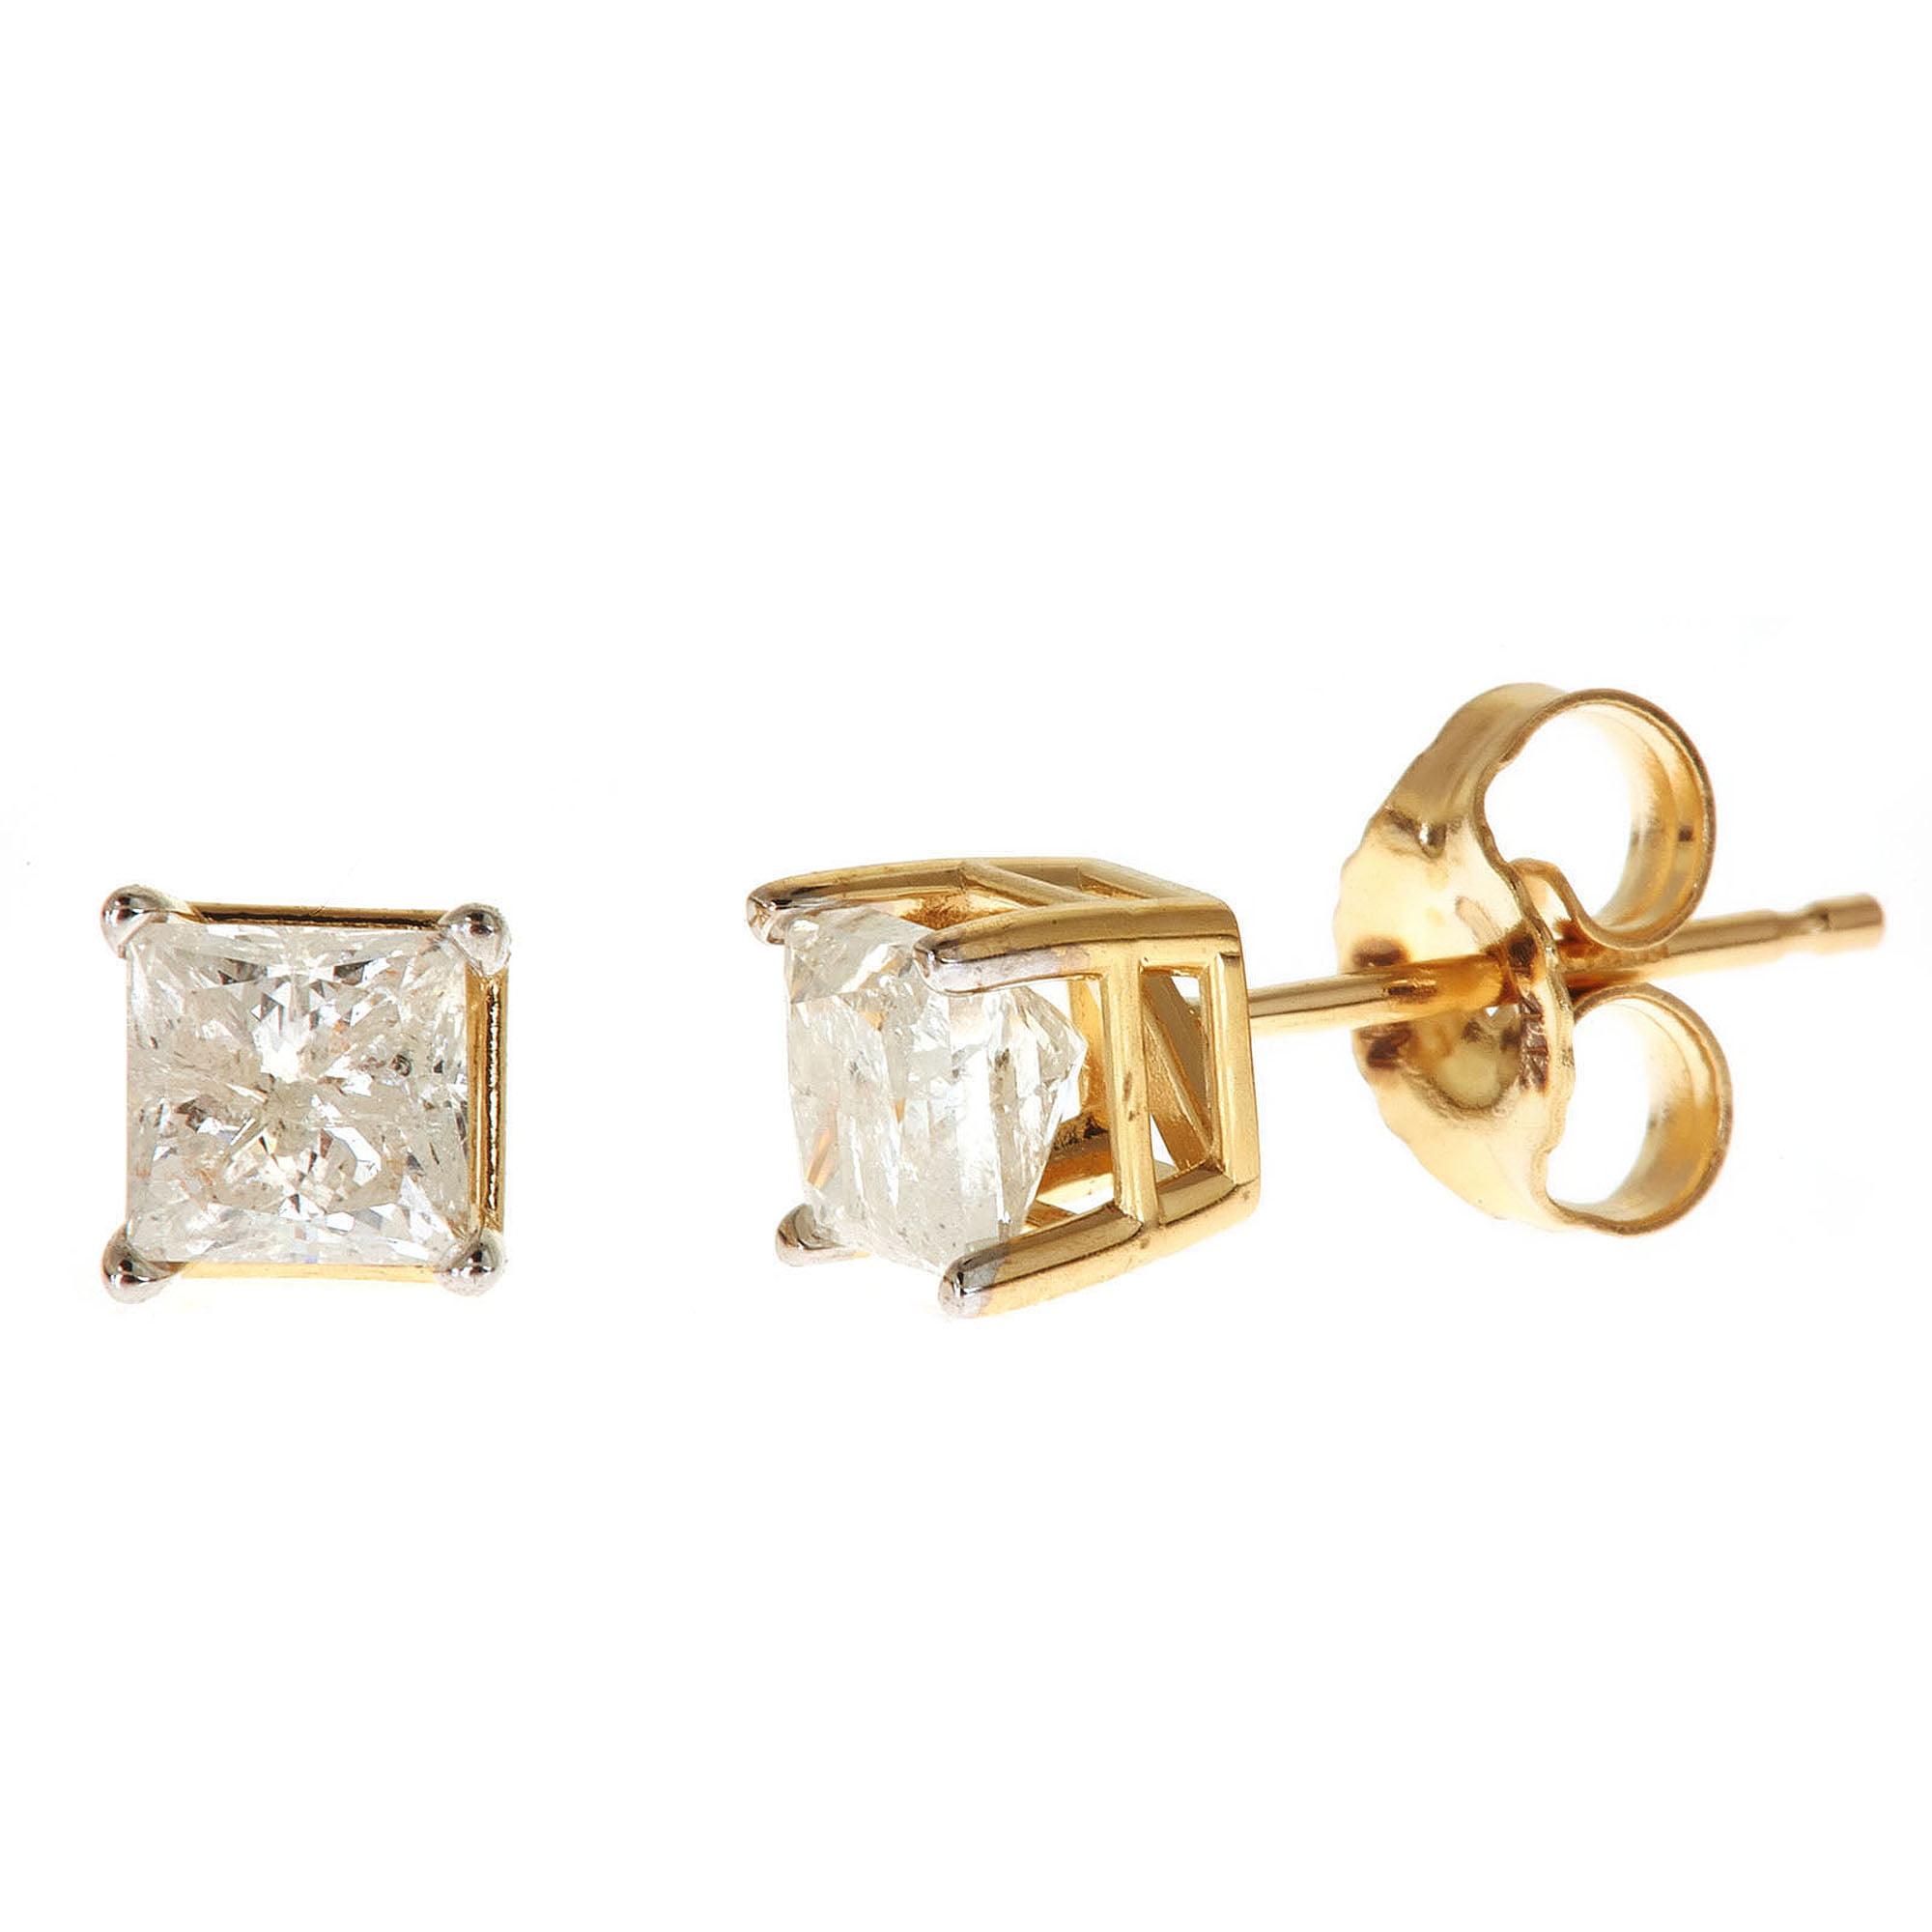 1 Carat T.W. Princess White Diamond 14kt Yellow Gold Stud Earrings, IGL certified